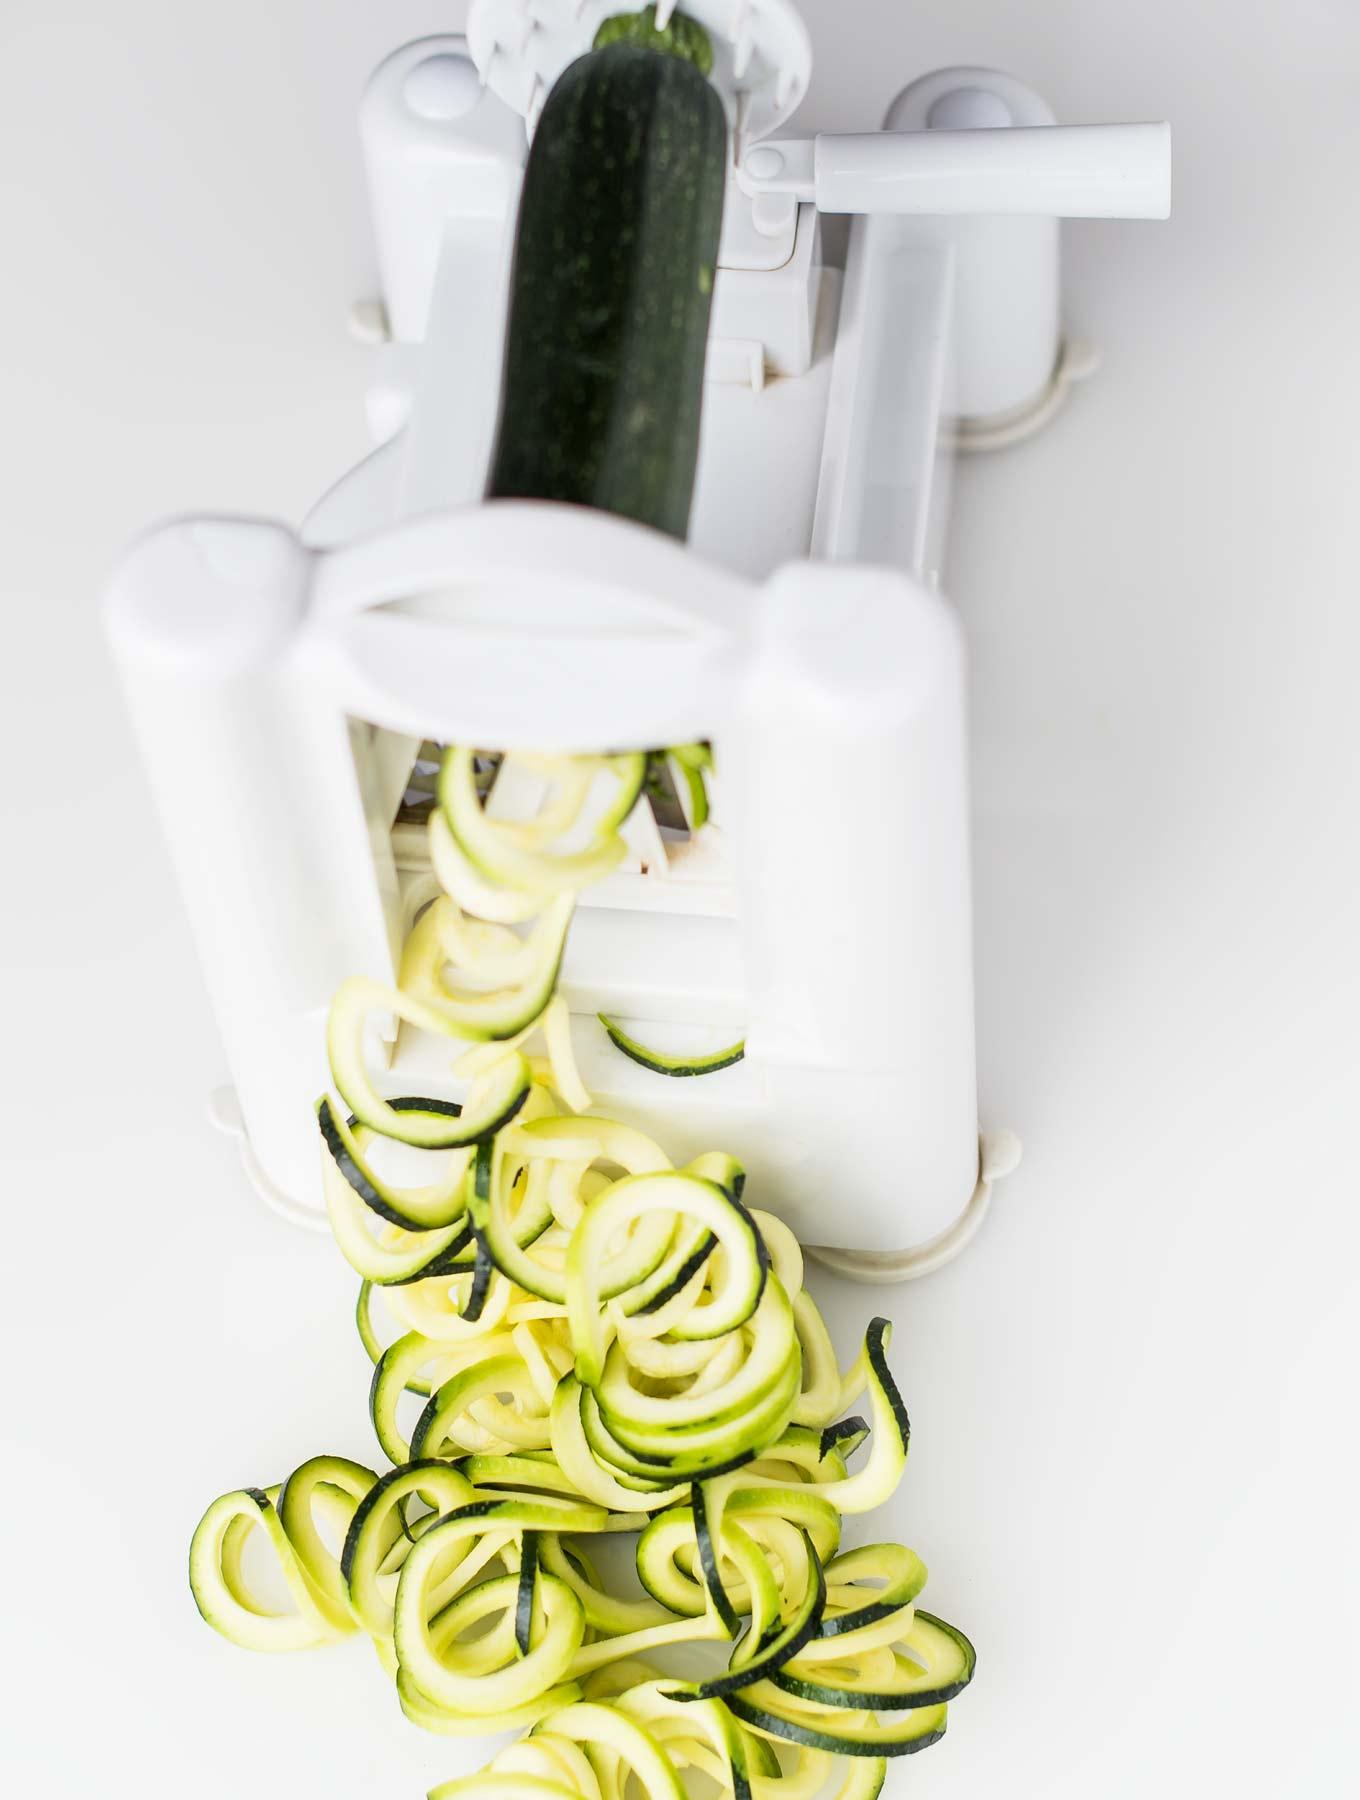 Spiraled Zucchini